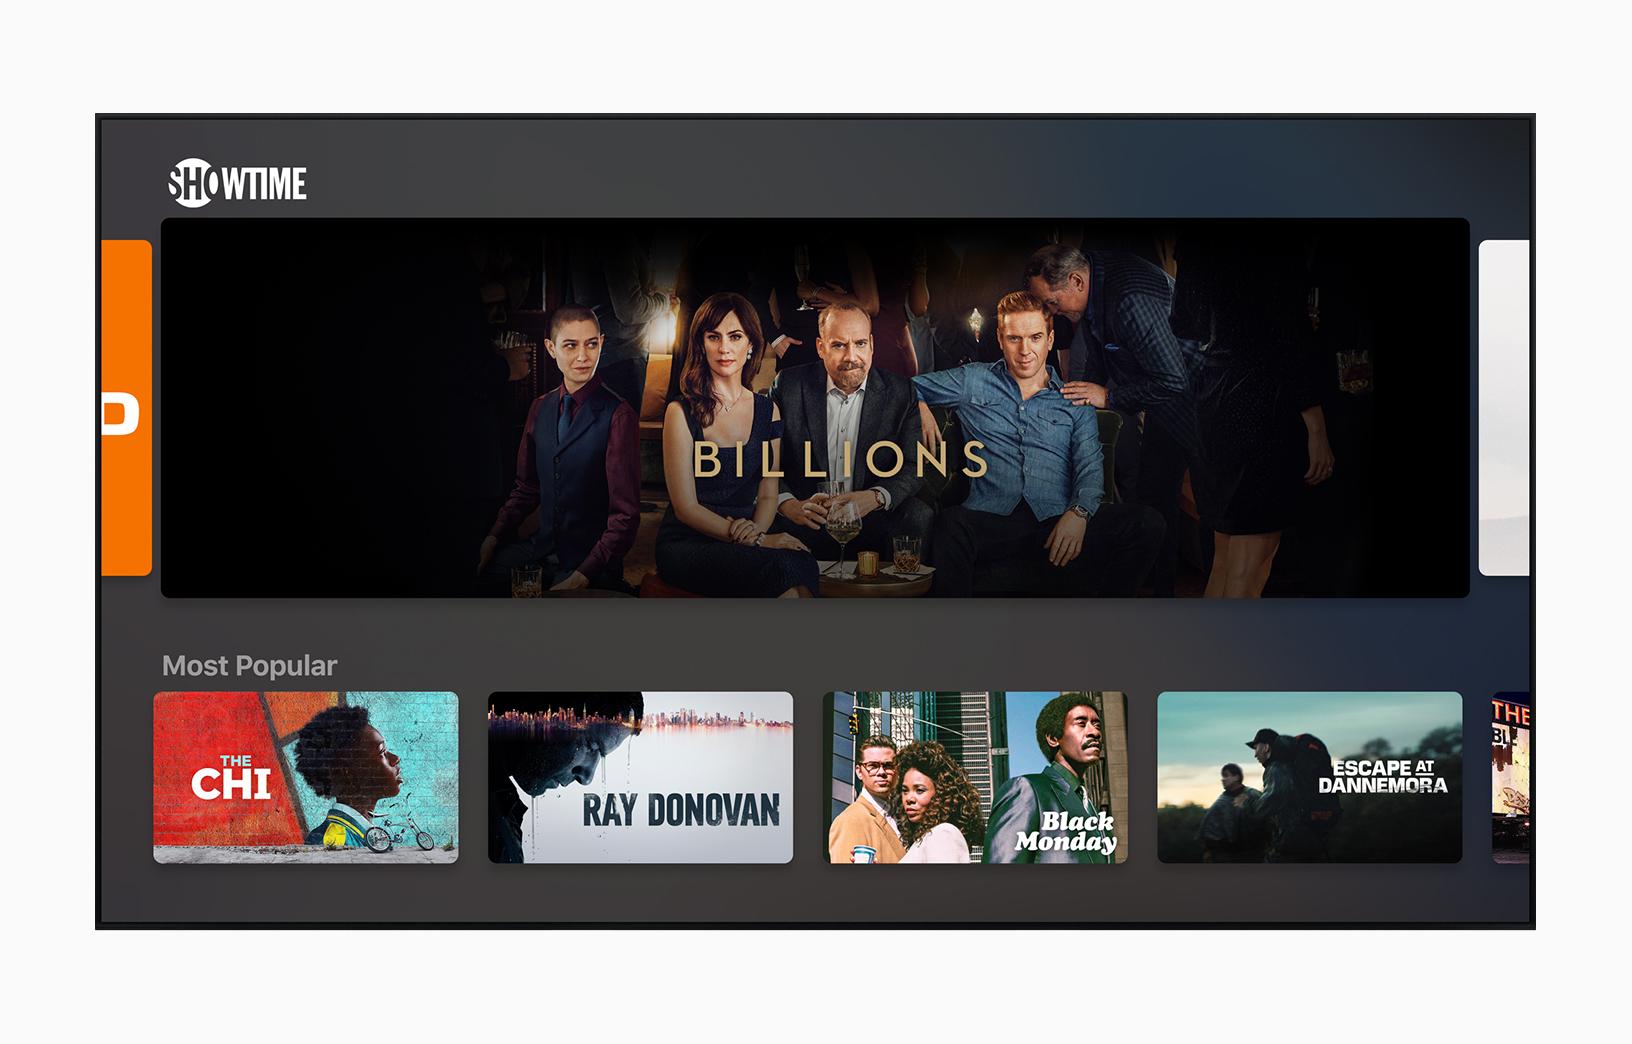 Apple_TV_app_shows-screen_032519.jpg